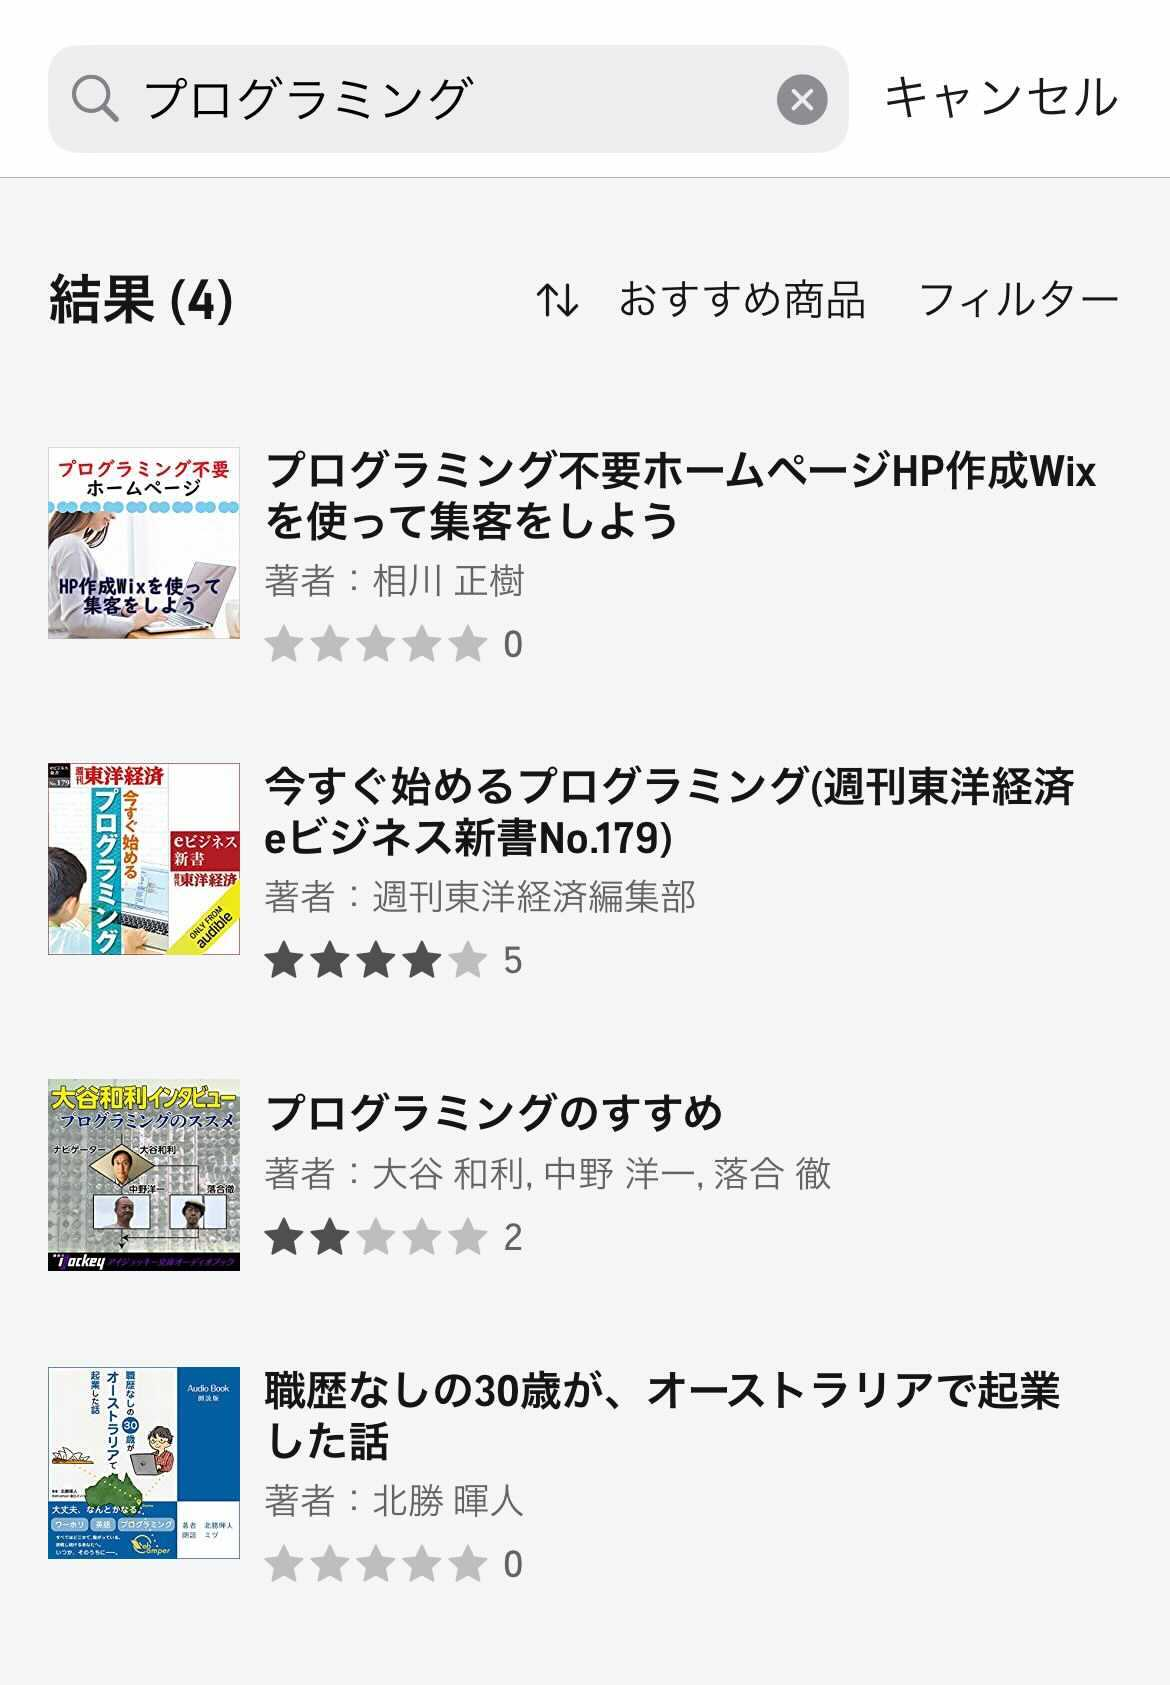 Audible(オーディブル)アプリ